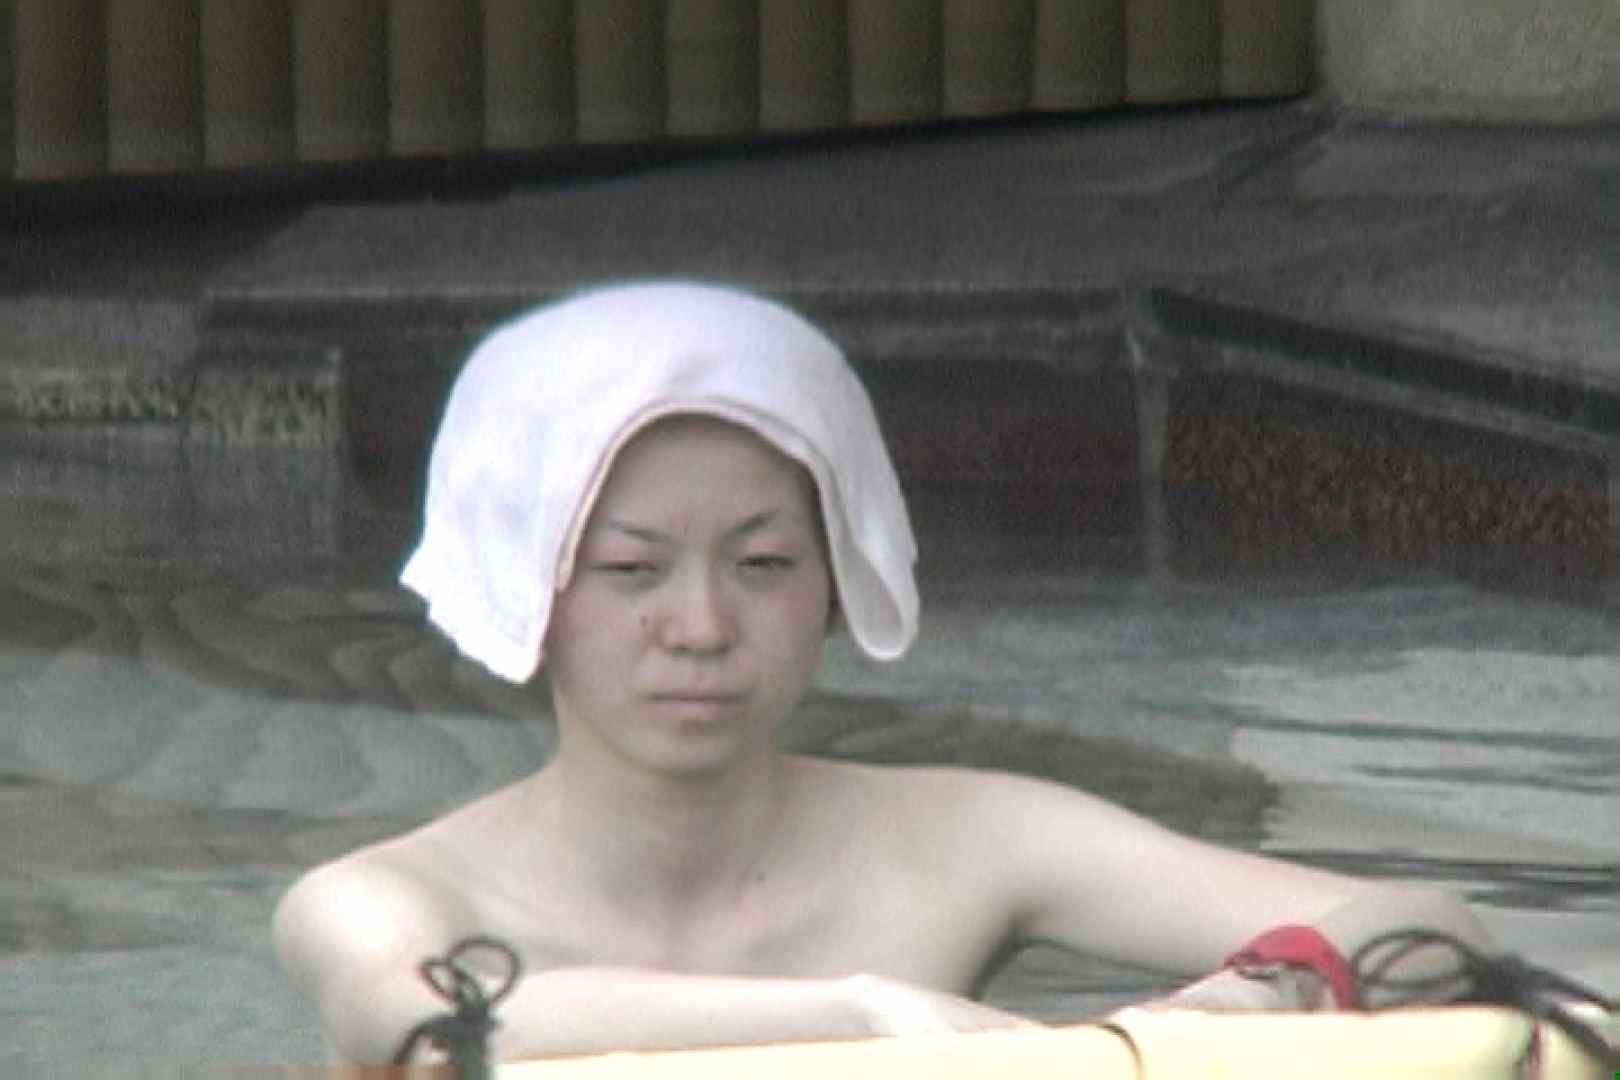 Aquaな露天風呂Vol.693 露天風呂編 | 盗撮シリーズ  105PIX 7